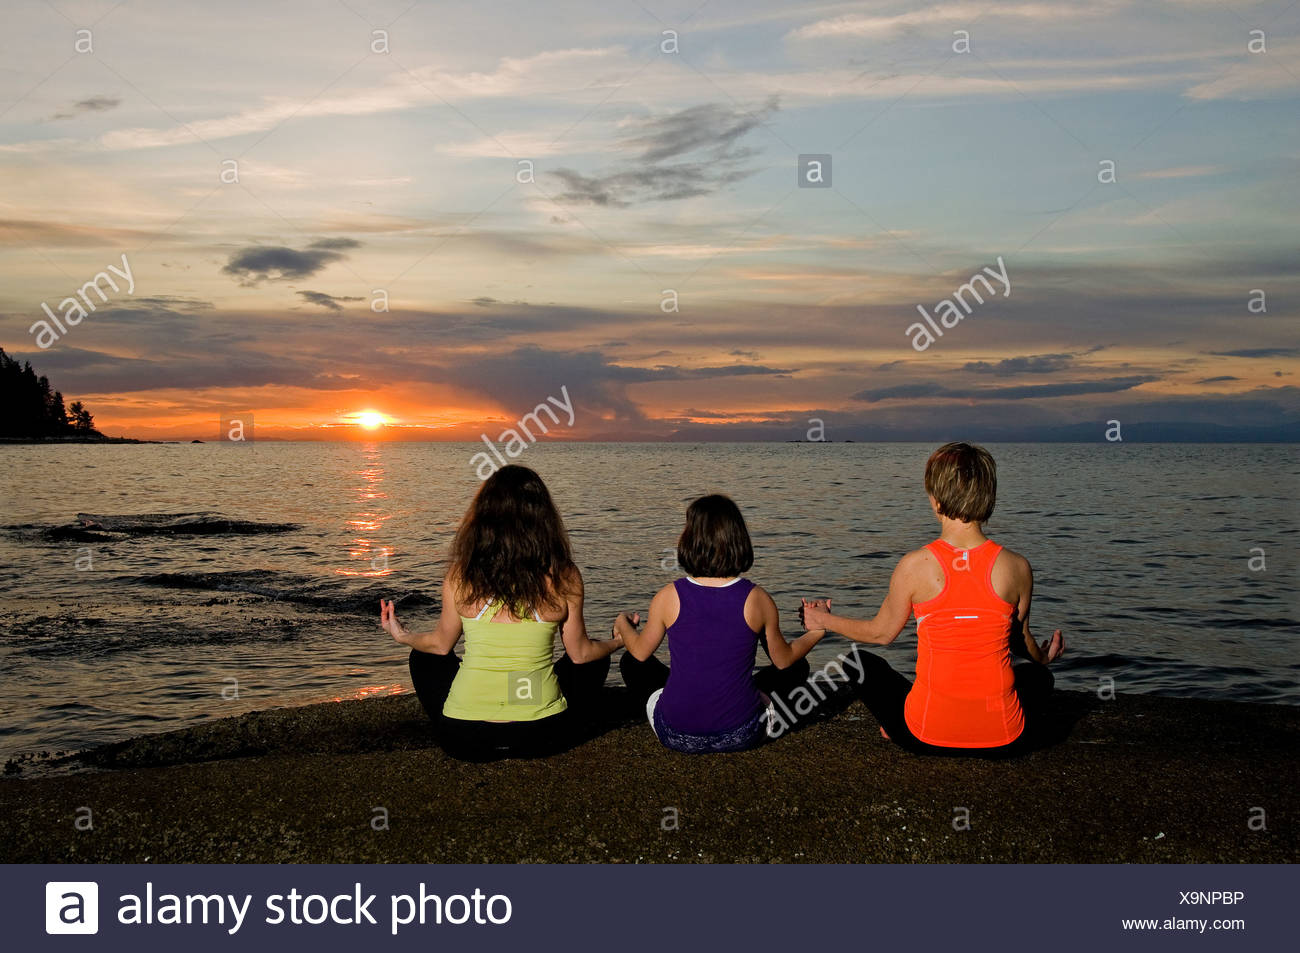 cocle single girls Dating service and matchmaking for single women in panama women seeking men in panama.